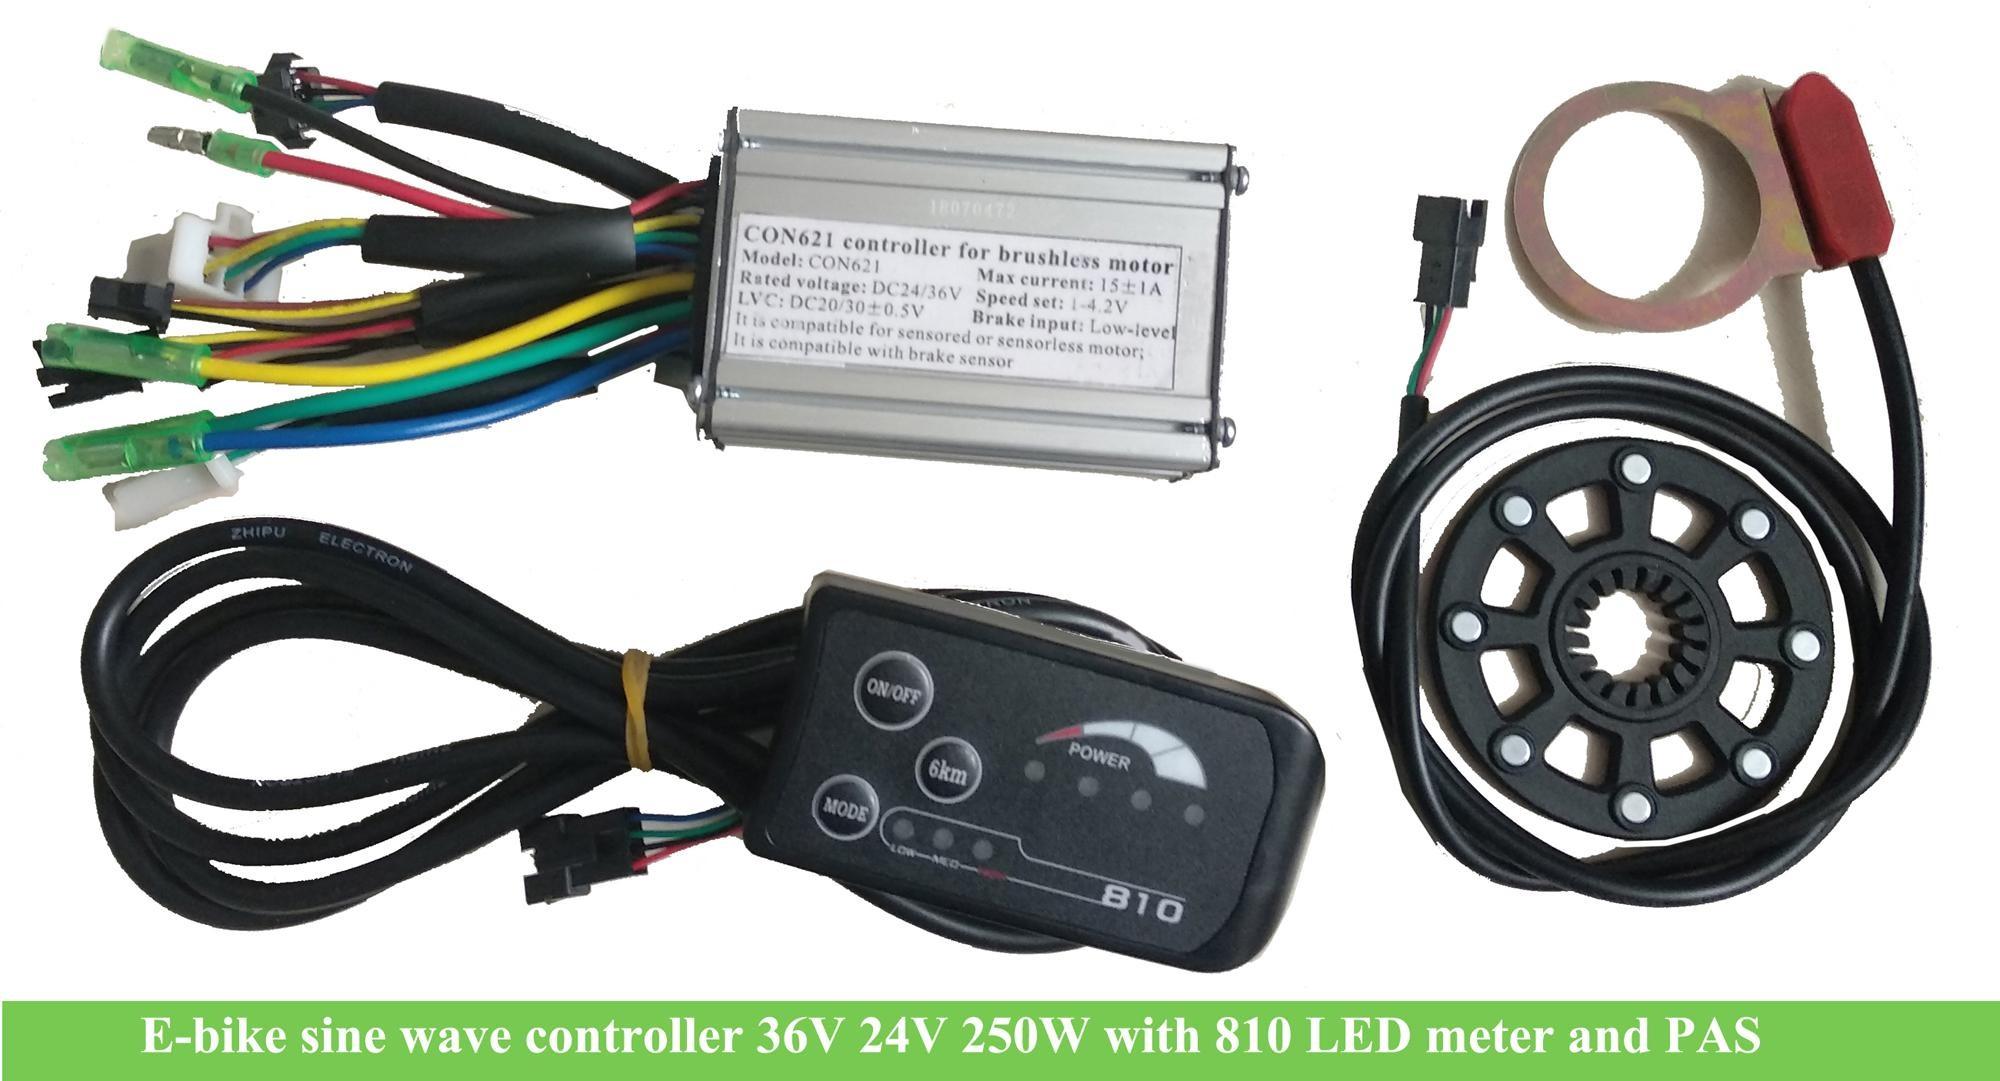 PROGRAMMABLE E BIKE ELECTRIC BRUSHLESS MOTOR CONTROLLER